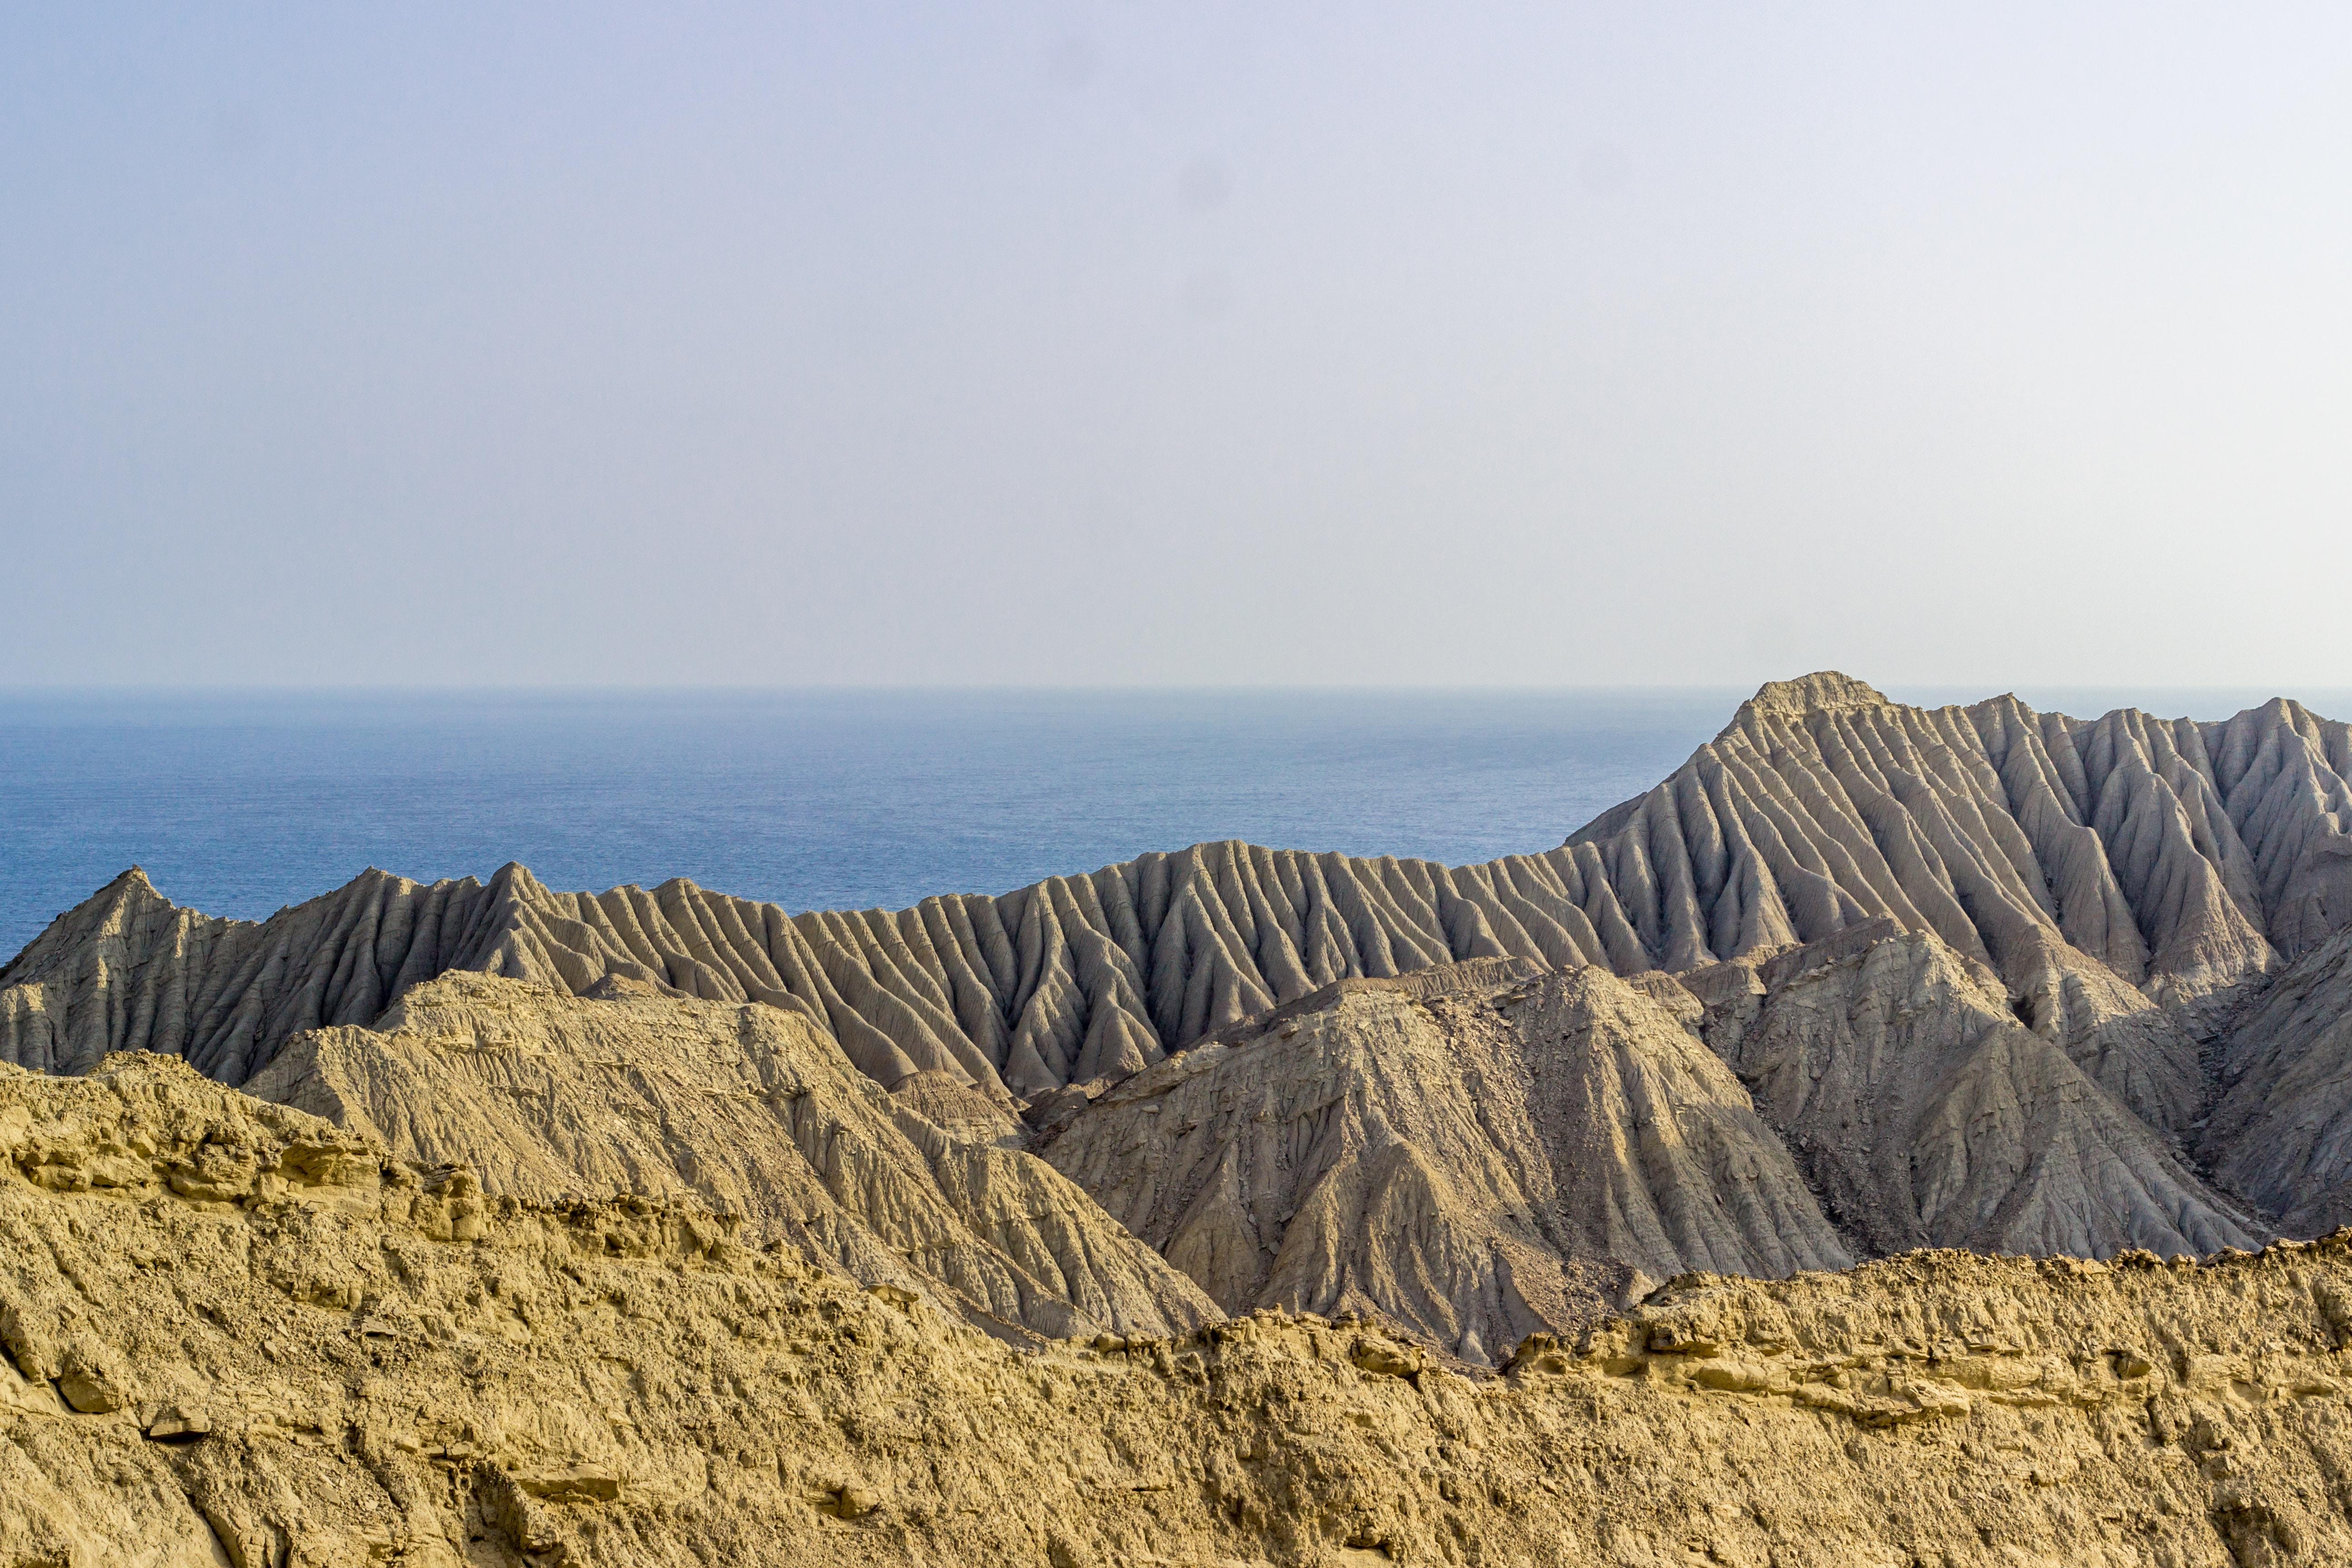 beige and gray mountain ridge